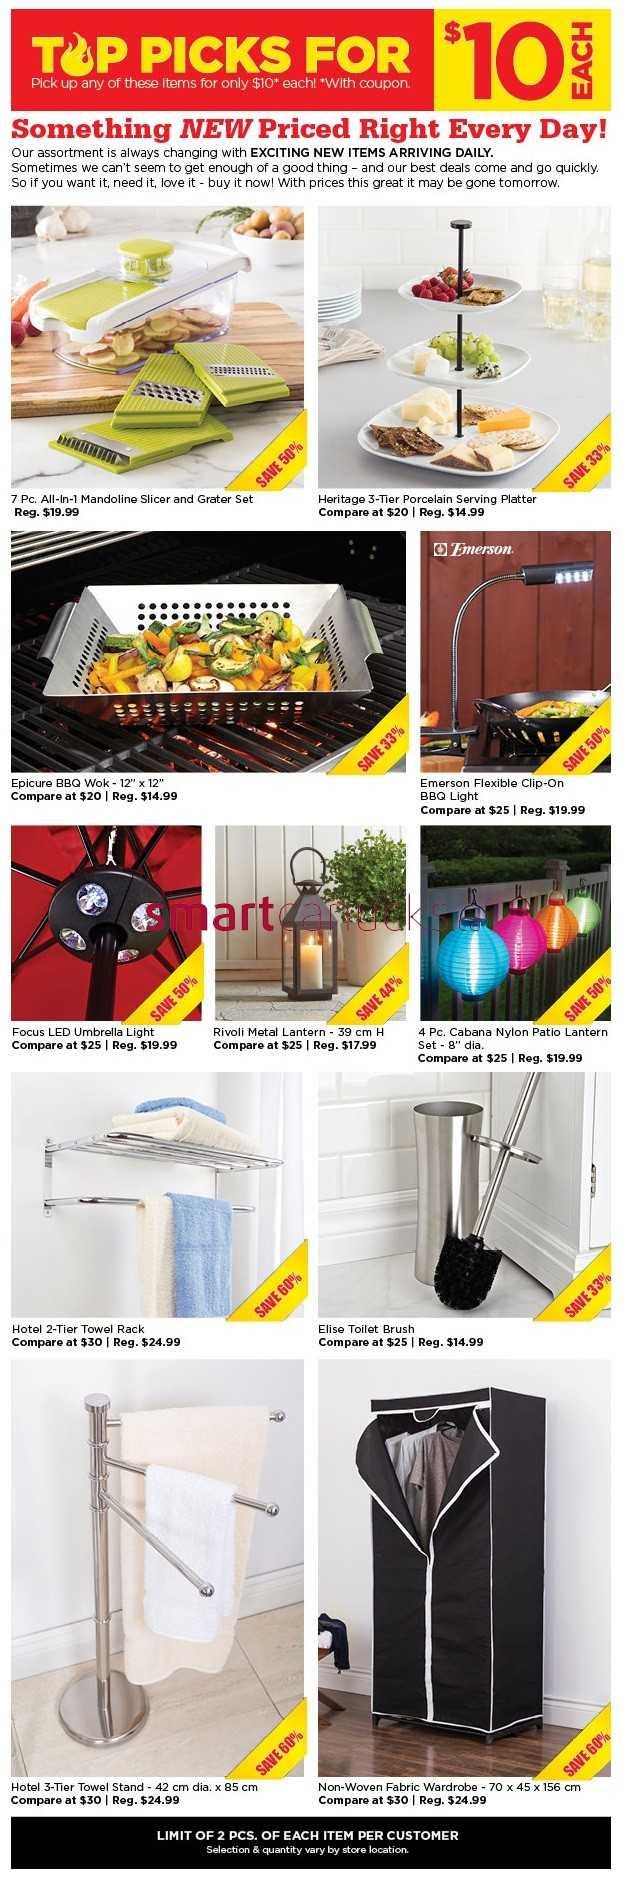 Stunning Kitchen Stuff Plus $10 Red Hot Deals July 16 to 26 623 x 1885 · 353 kB · jpeg